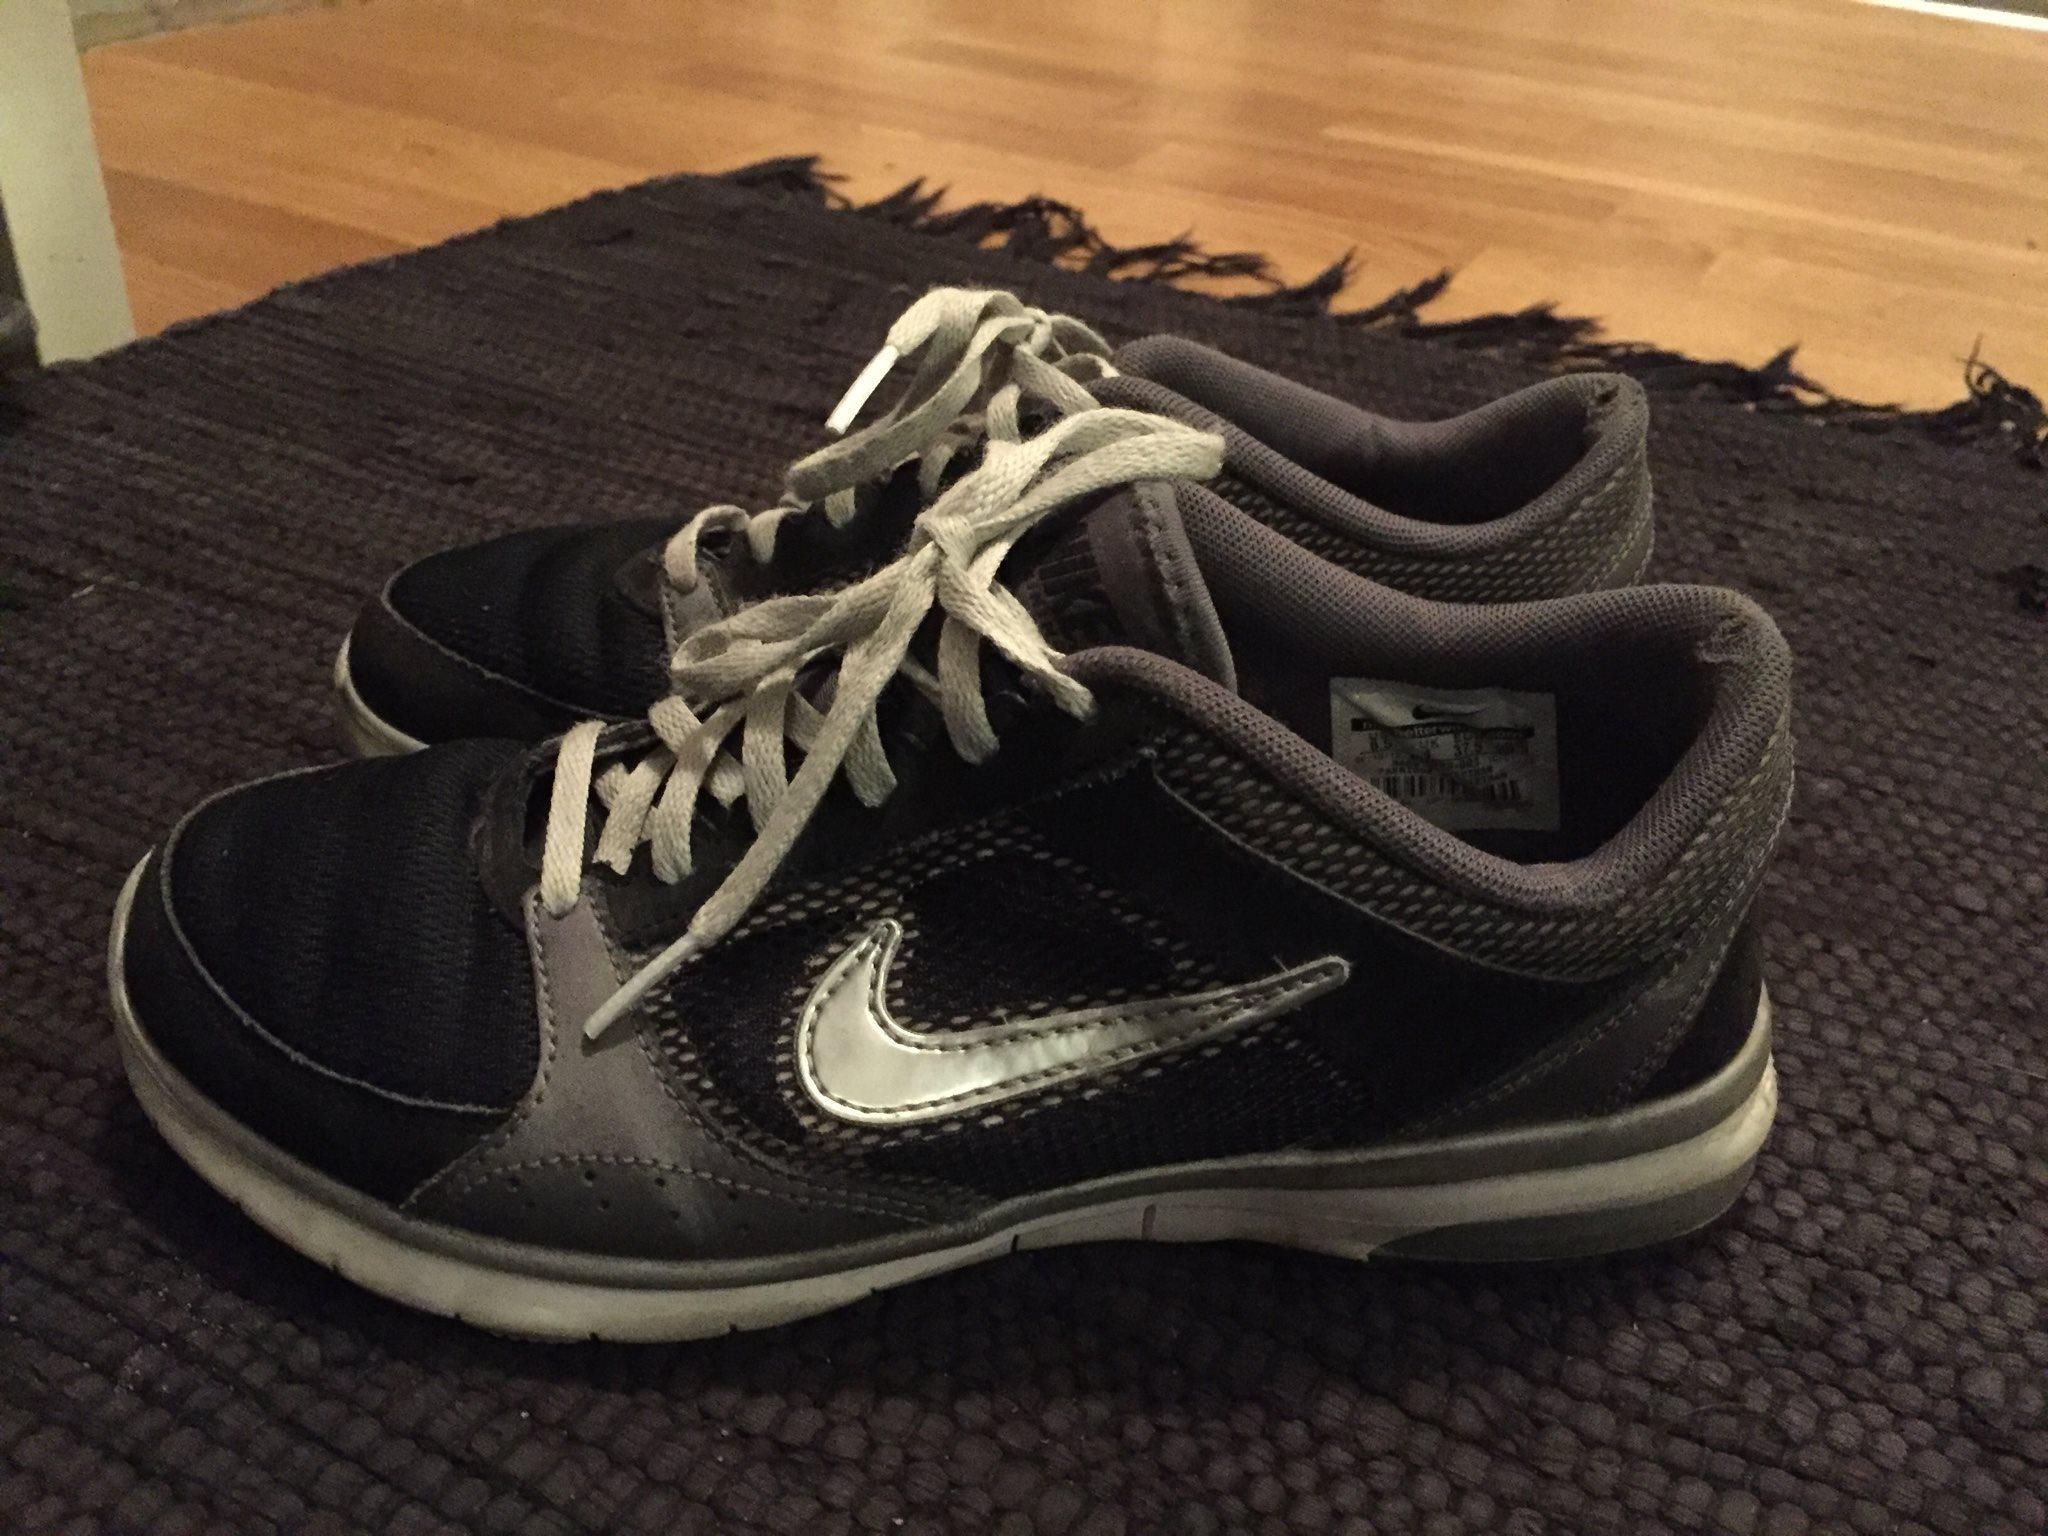 best website 9cb51 891d4 Nike gympaskor träningsskor strl 37,5